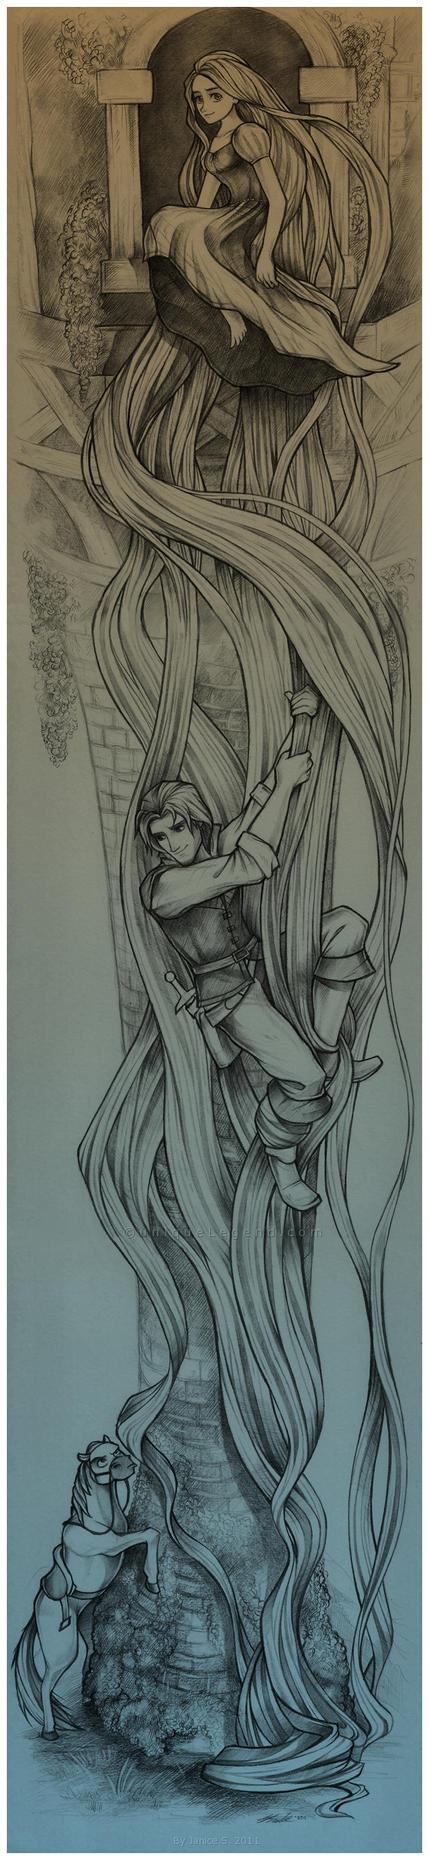 Disney - Tangled by EternaLegend